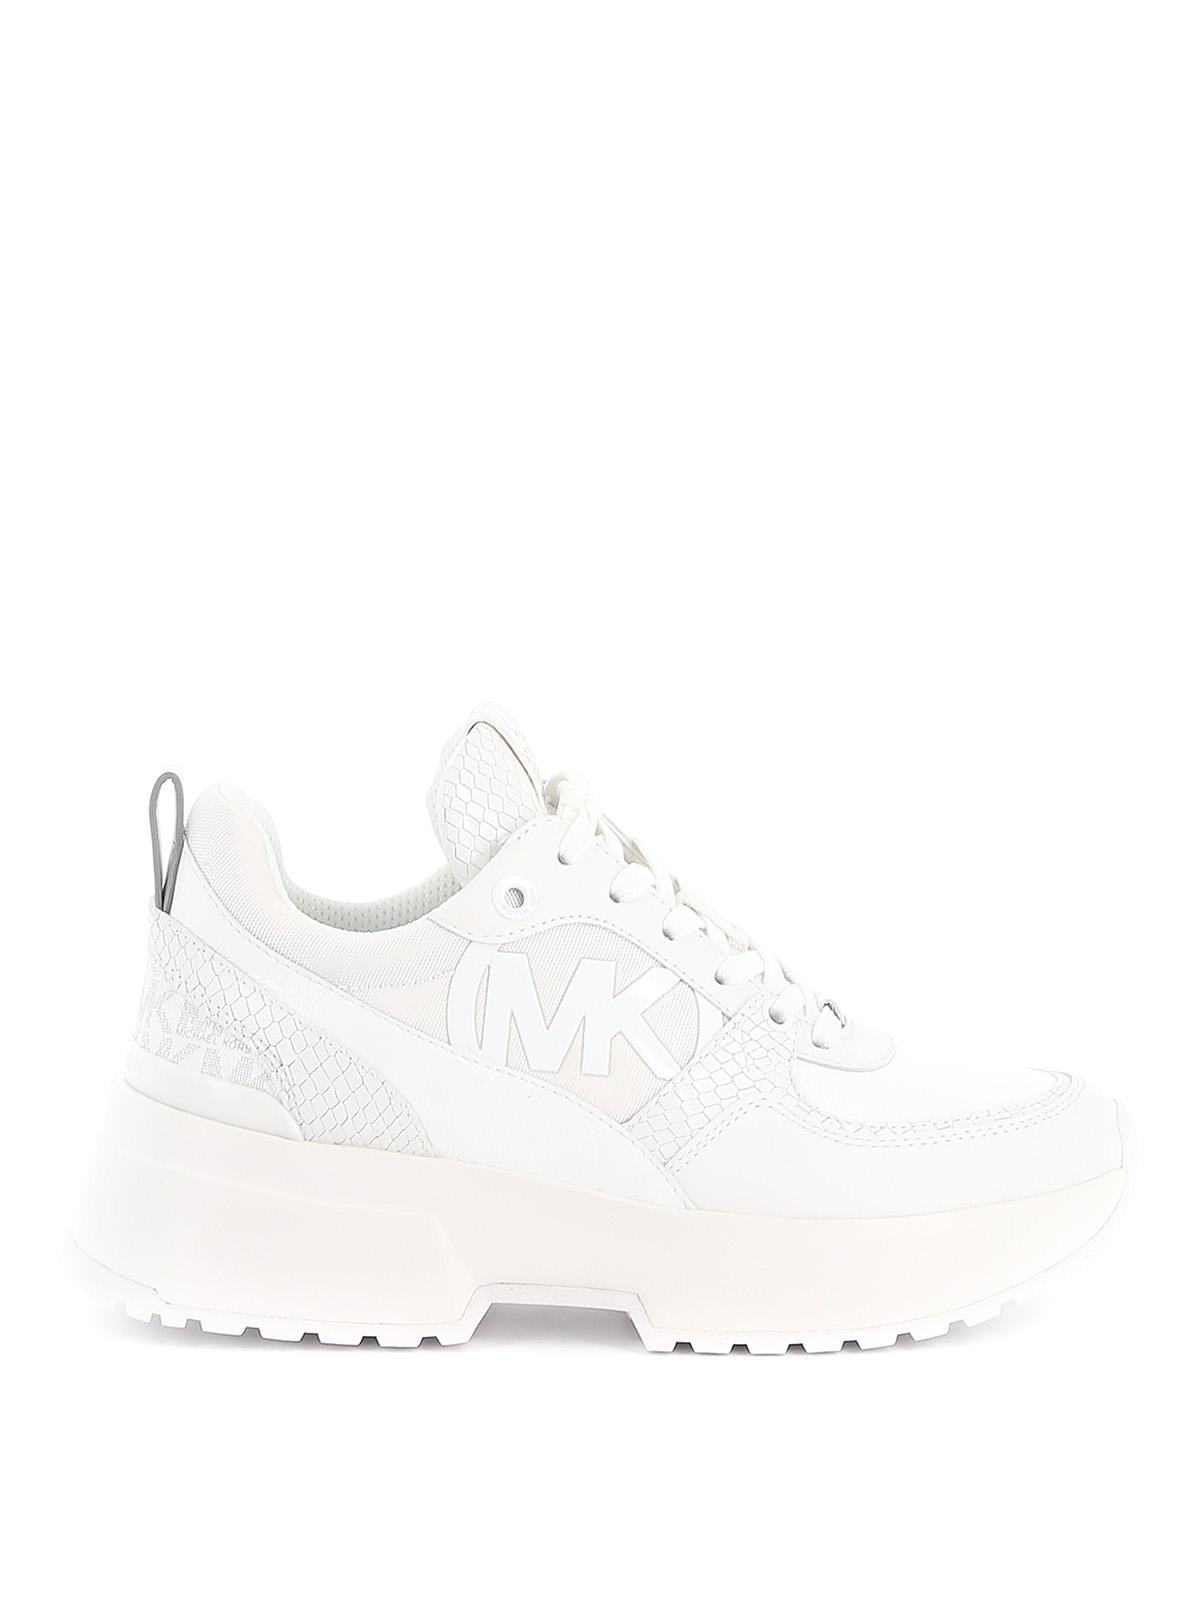 Michael Kors - Ballard sneakers